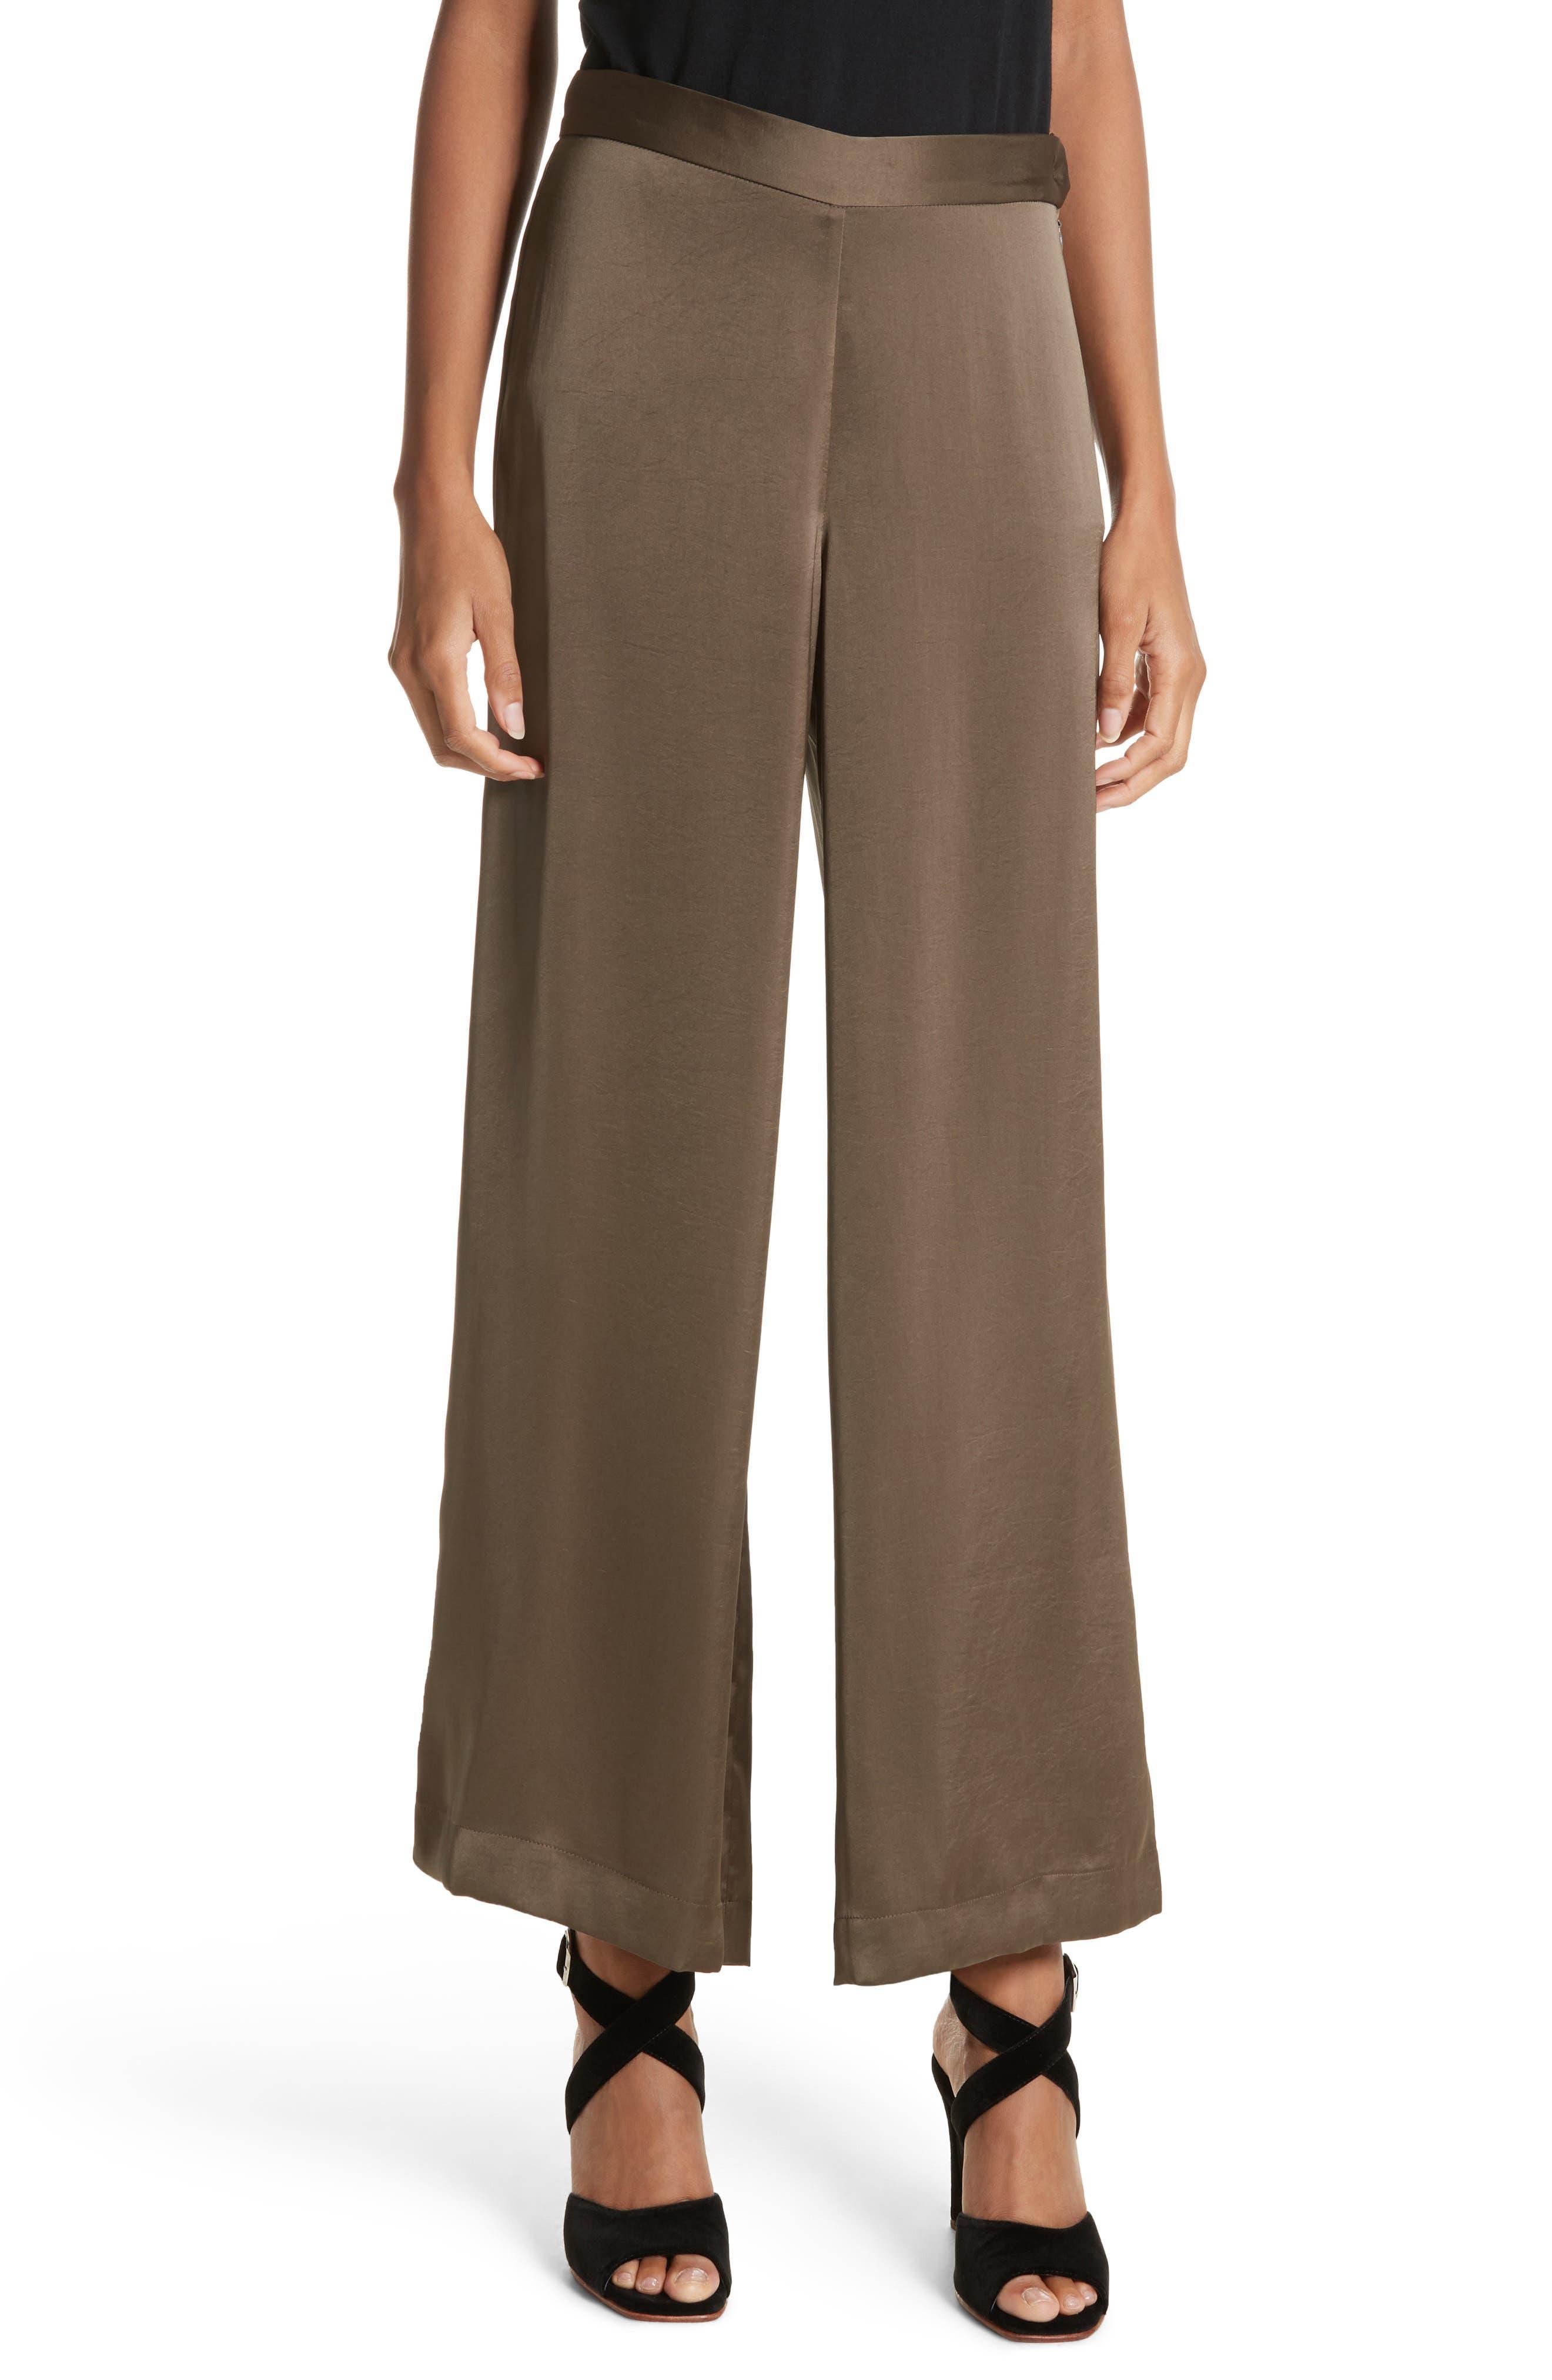 Cleric Satin Wide Leg Pants,                         Main,                         color, 265